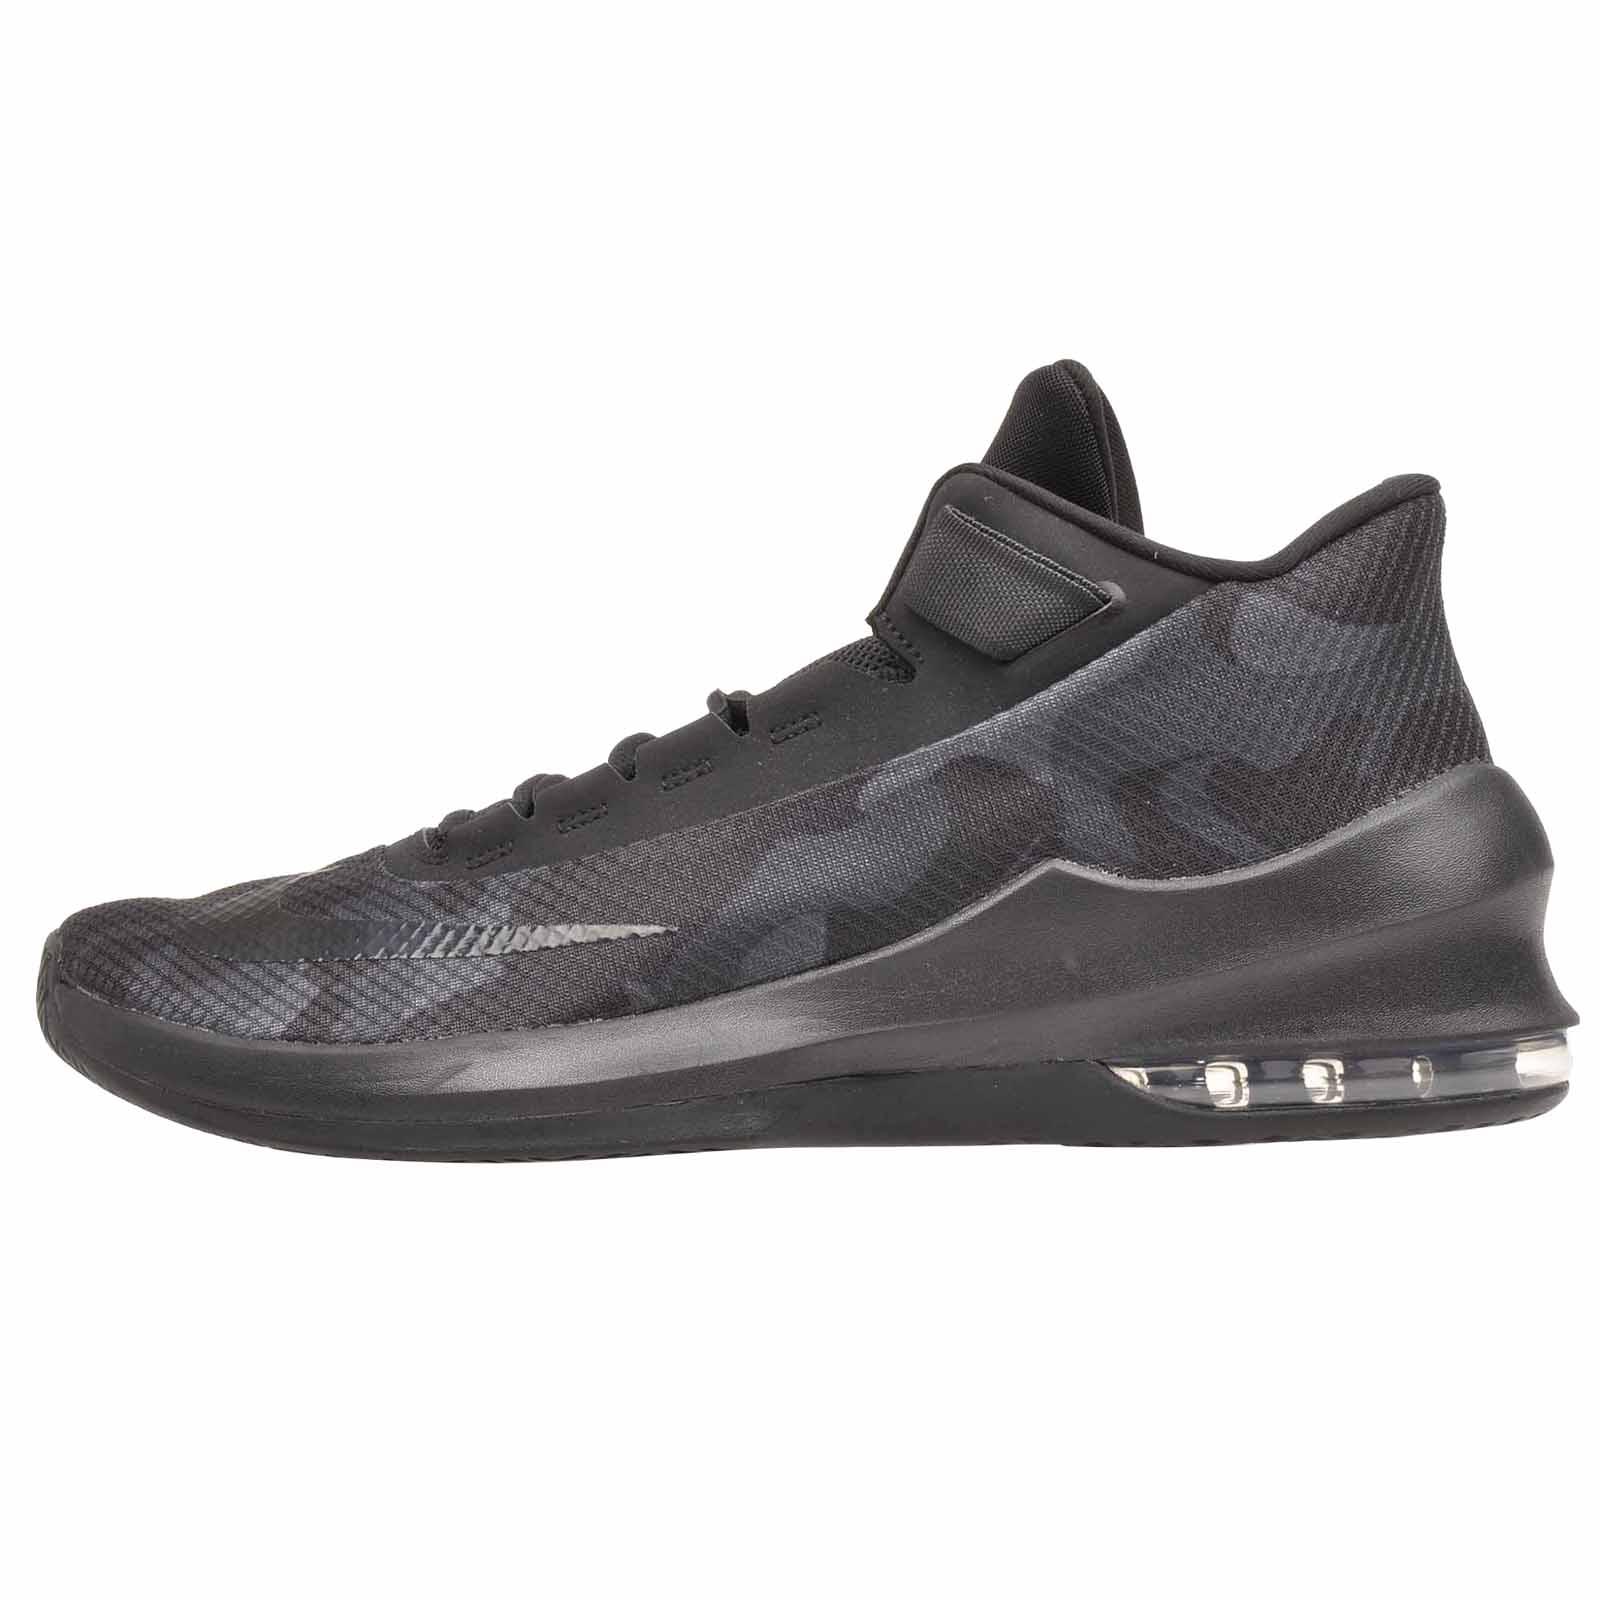 b2ab983174d1 Nike Air Max Infuriate 2 MID PRM Basketball Mens Shoes Black AO4428 ...